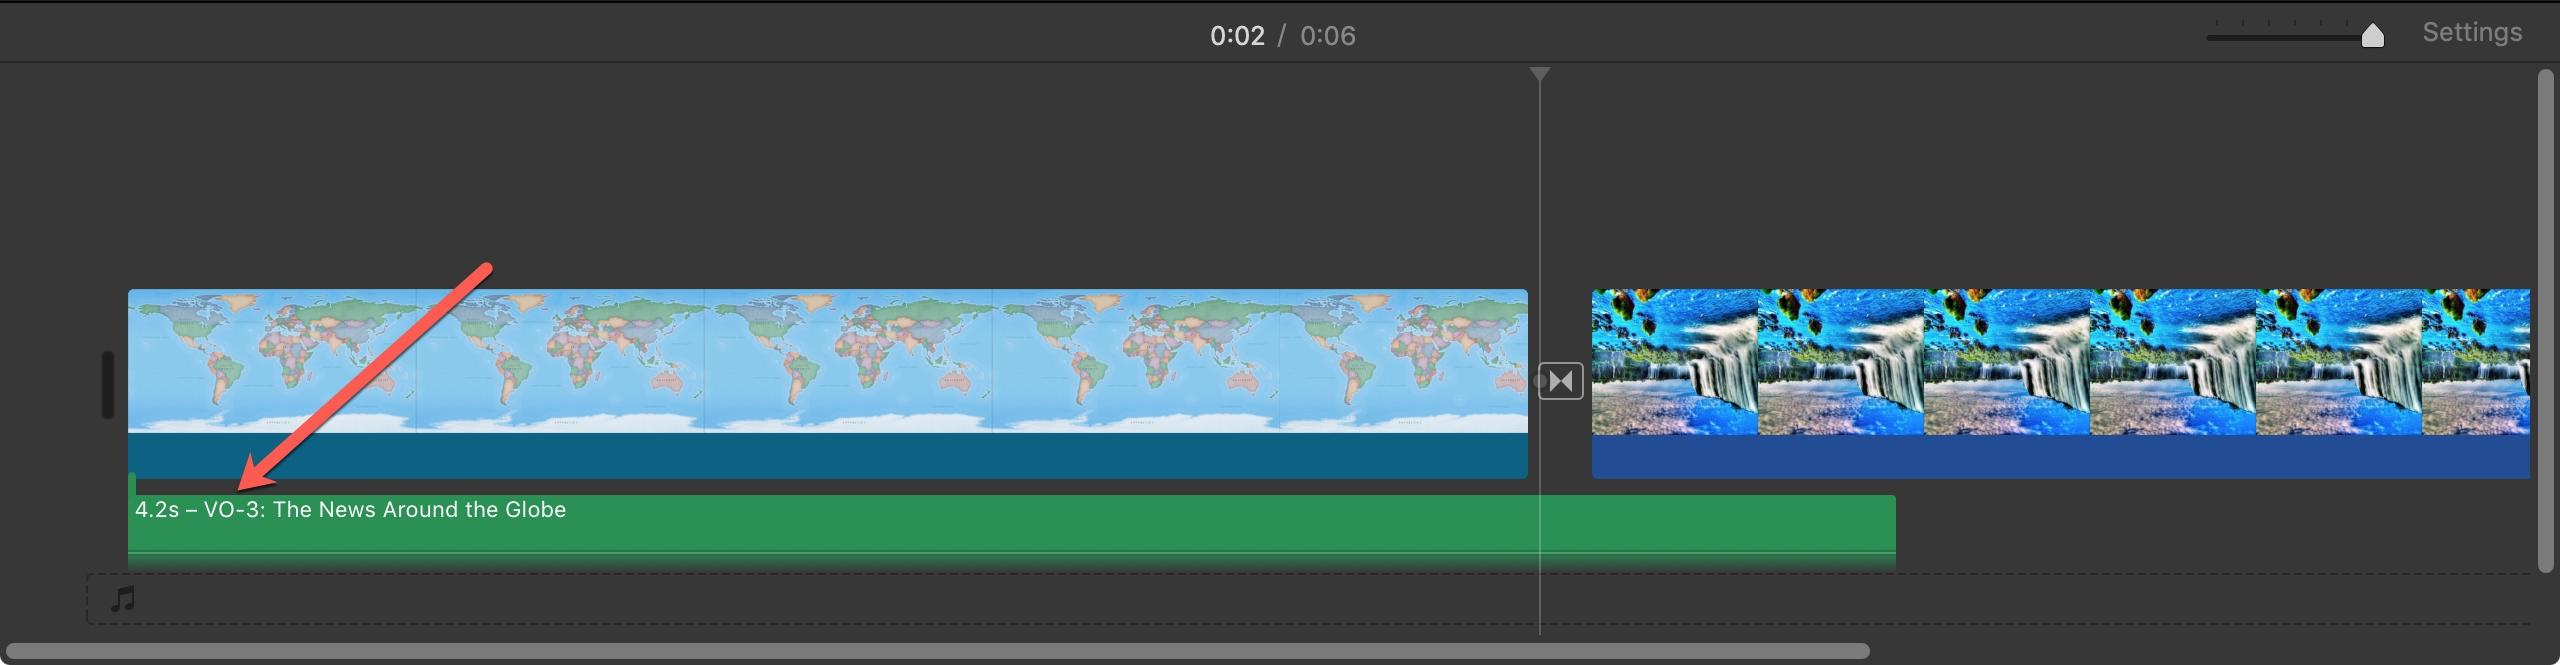 Voiceover Clip iMovie Mac